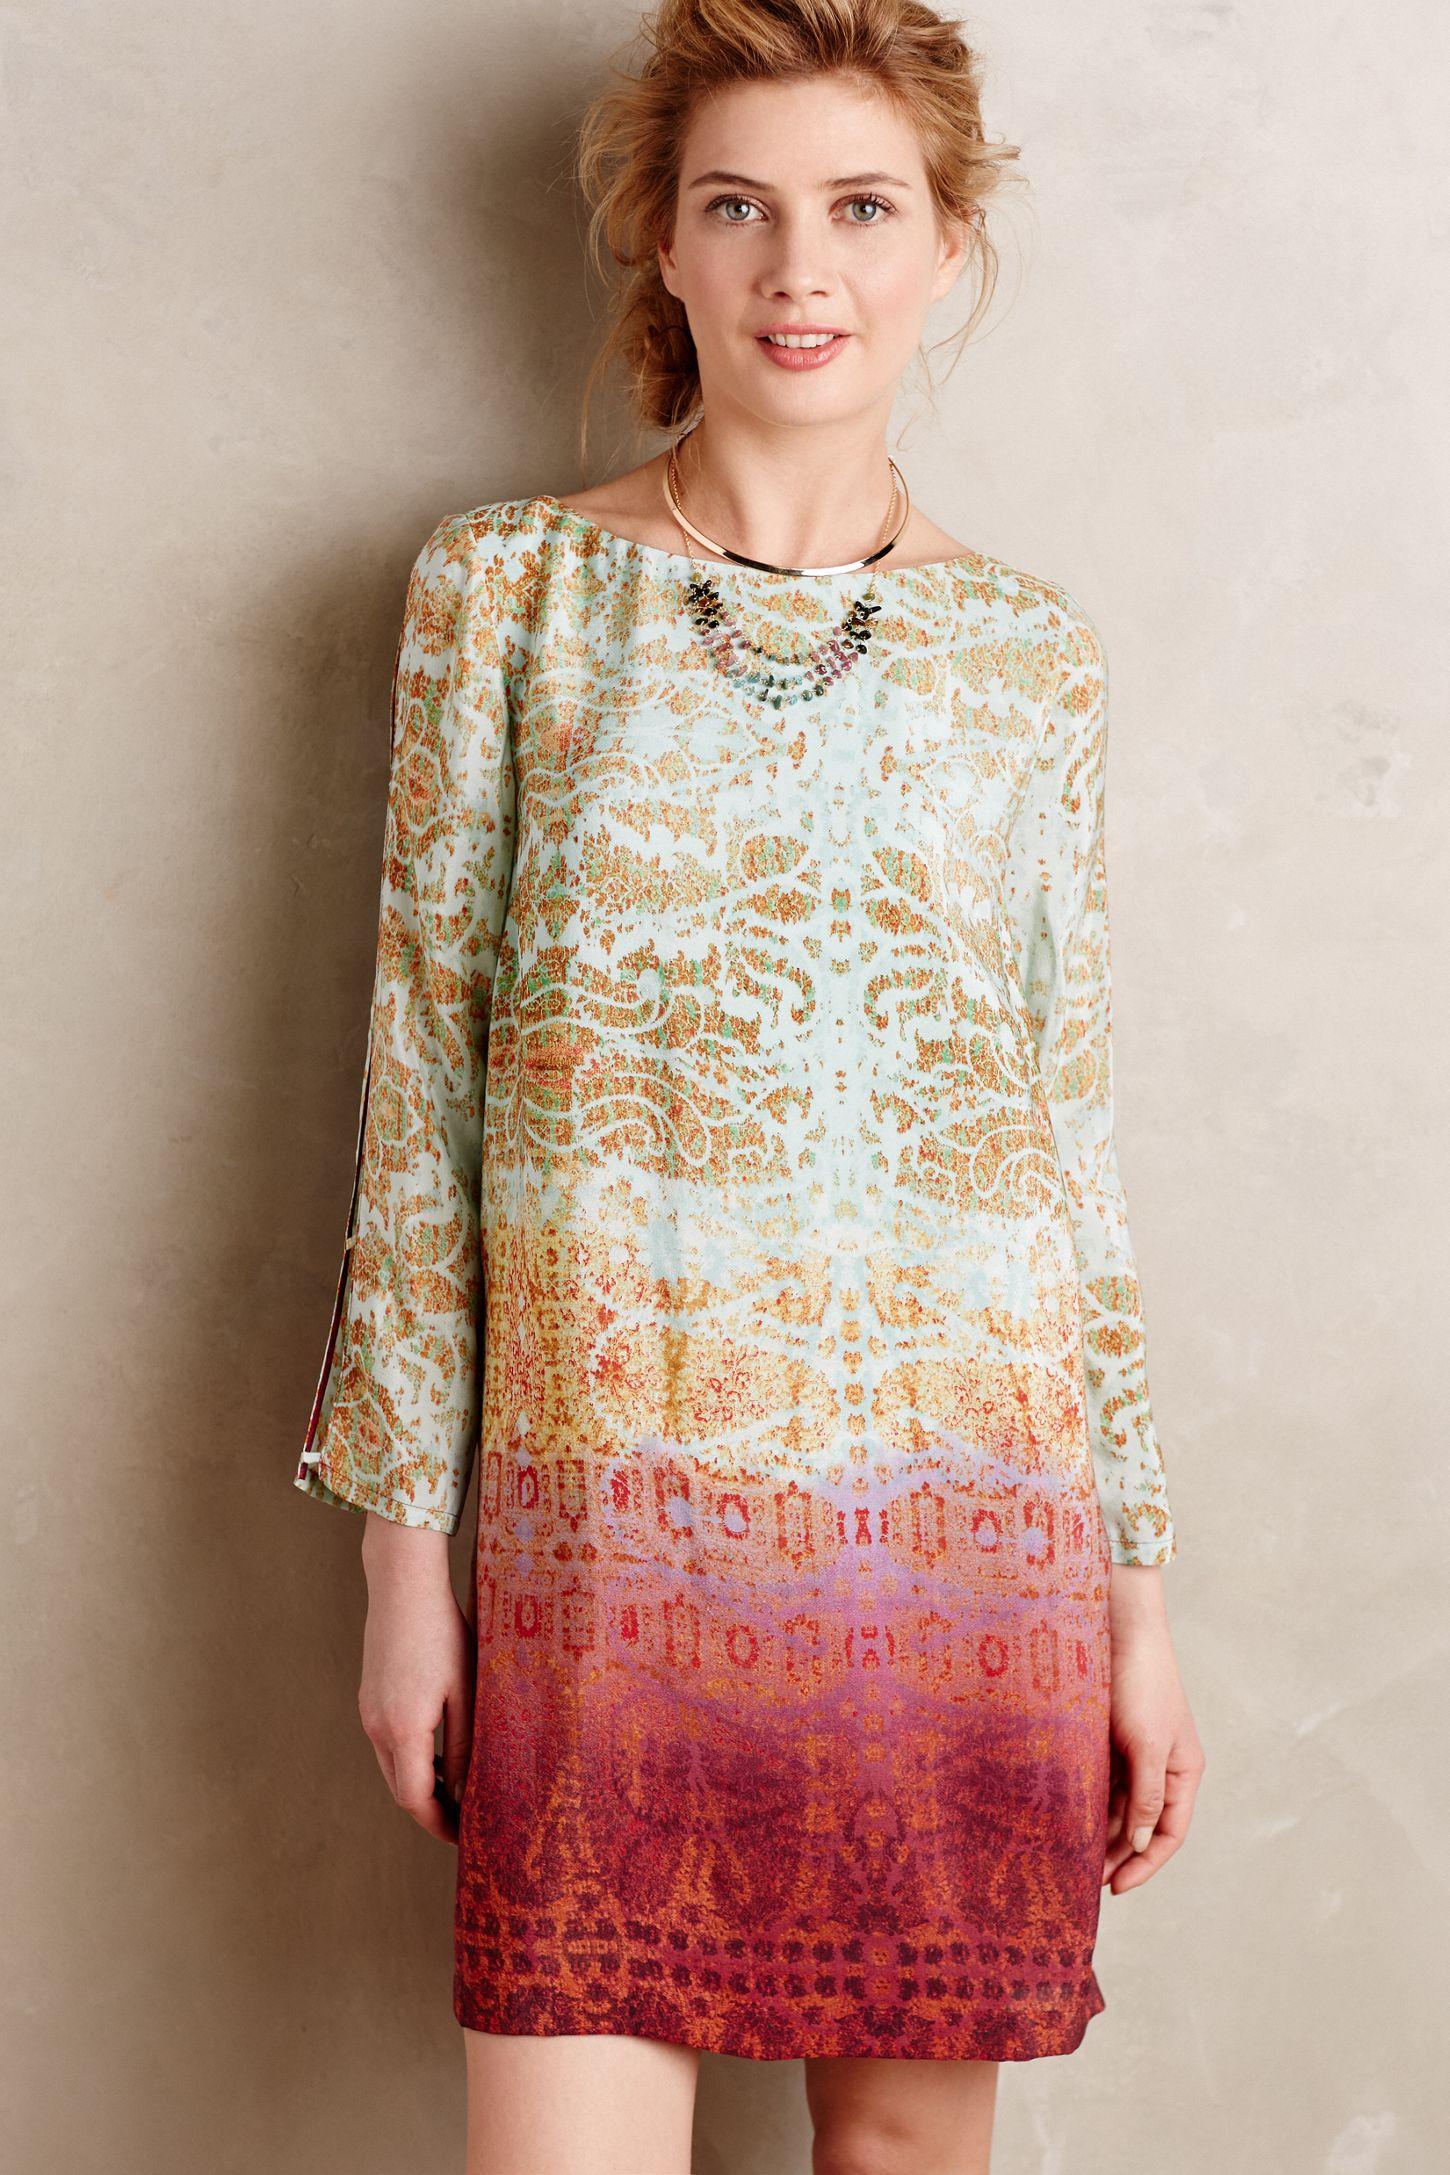 bdb4b4ff1c83 Cleome Dress | Anthropologie